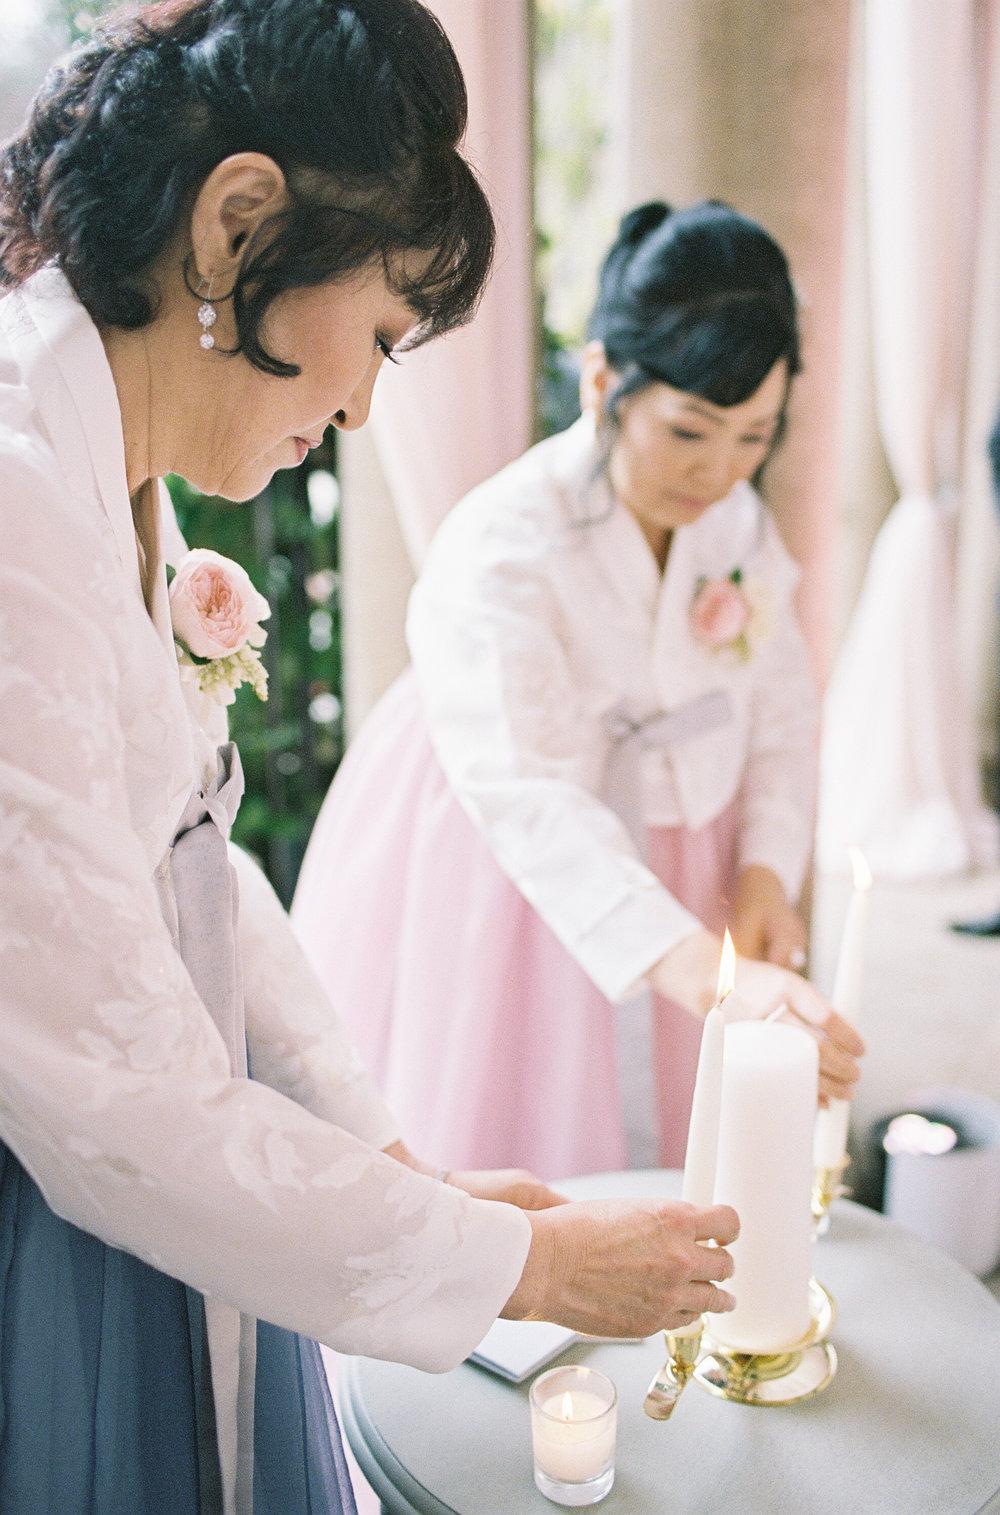 Athenaeum_Wedding_Hi_Res-51-Jen_Huang-005184-R1-007.jpg